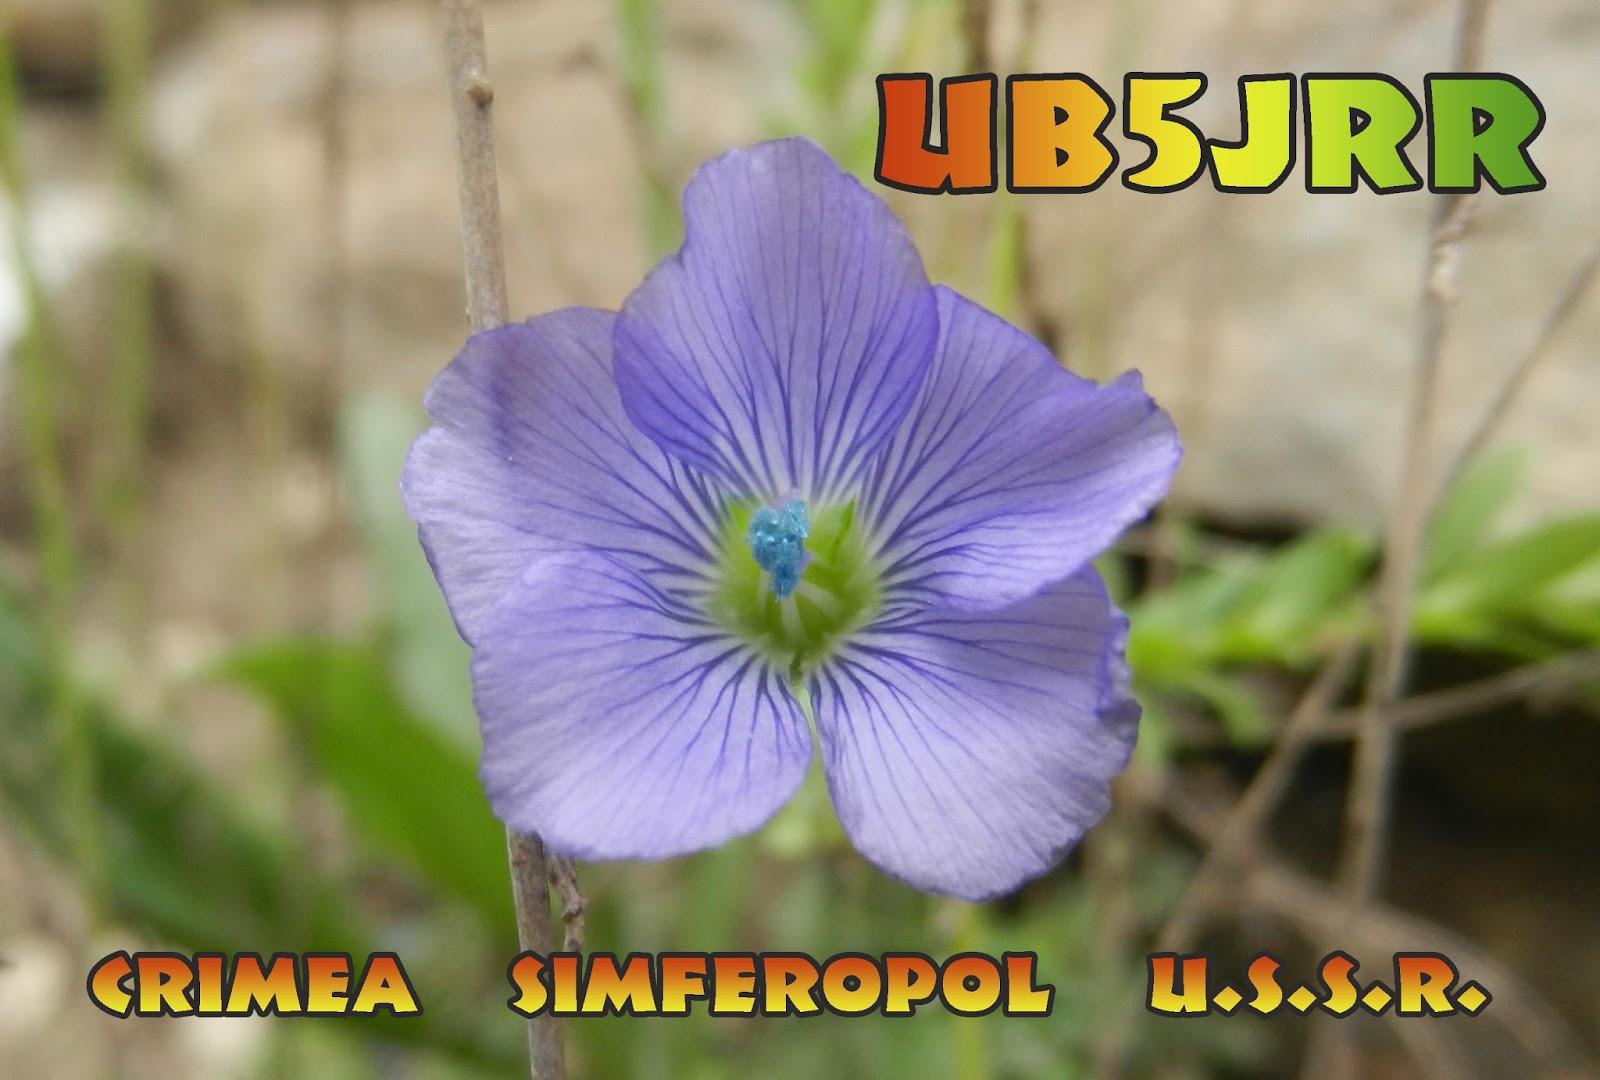 http://www.3w3rr.ru/2012/09/UB5JRR.html